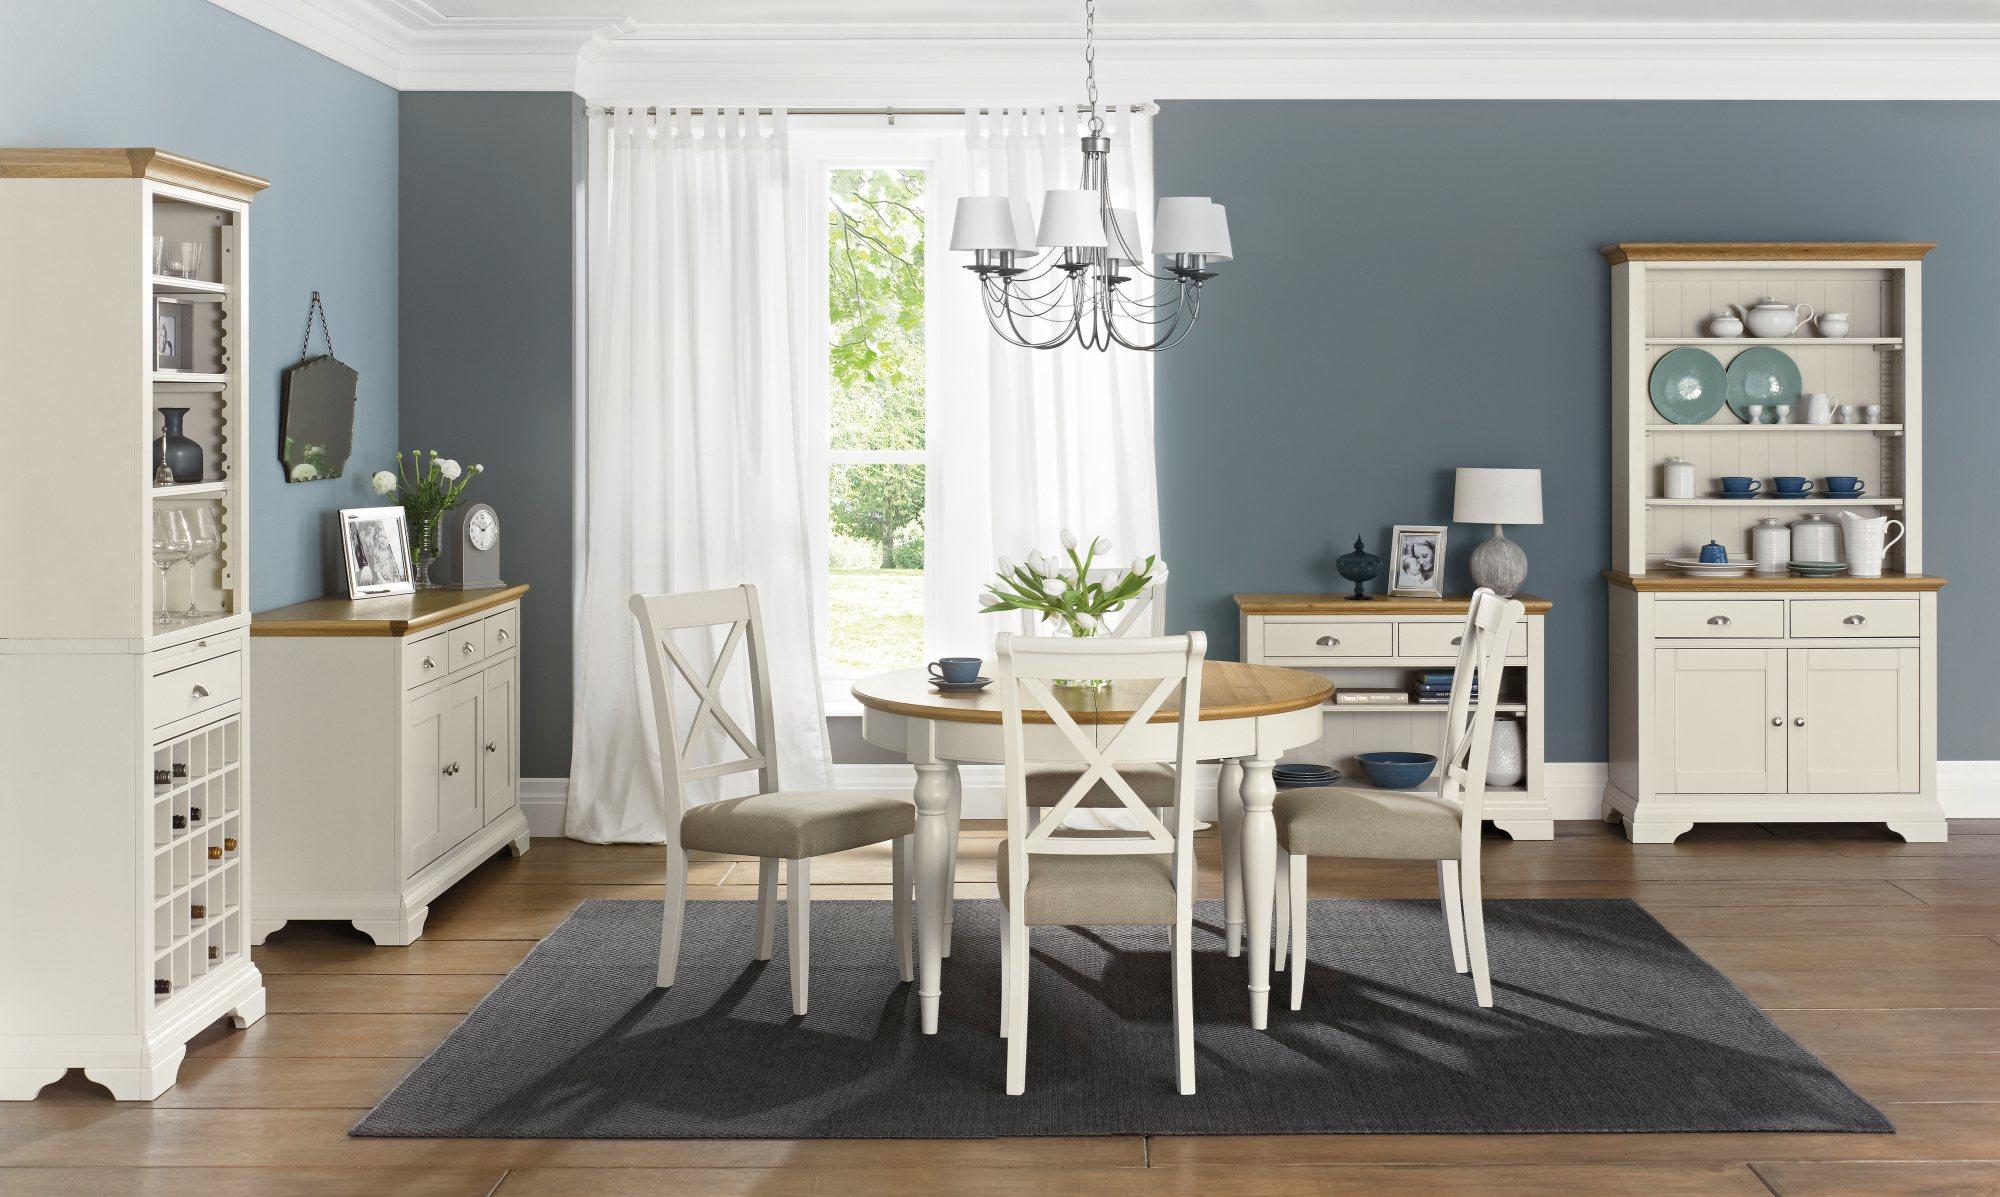 KYRA TWOTONE ROUND DINING TABLE L120cm x D120cm x H77cm